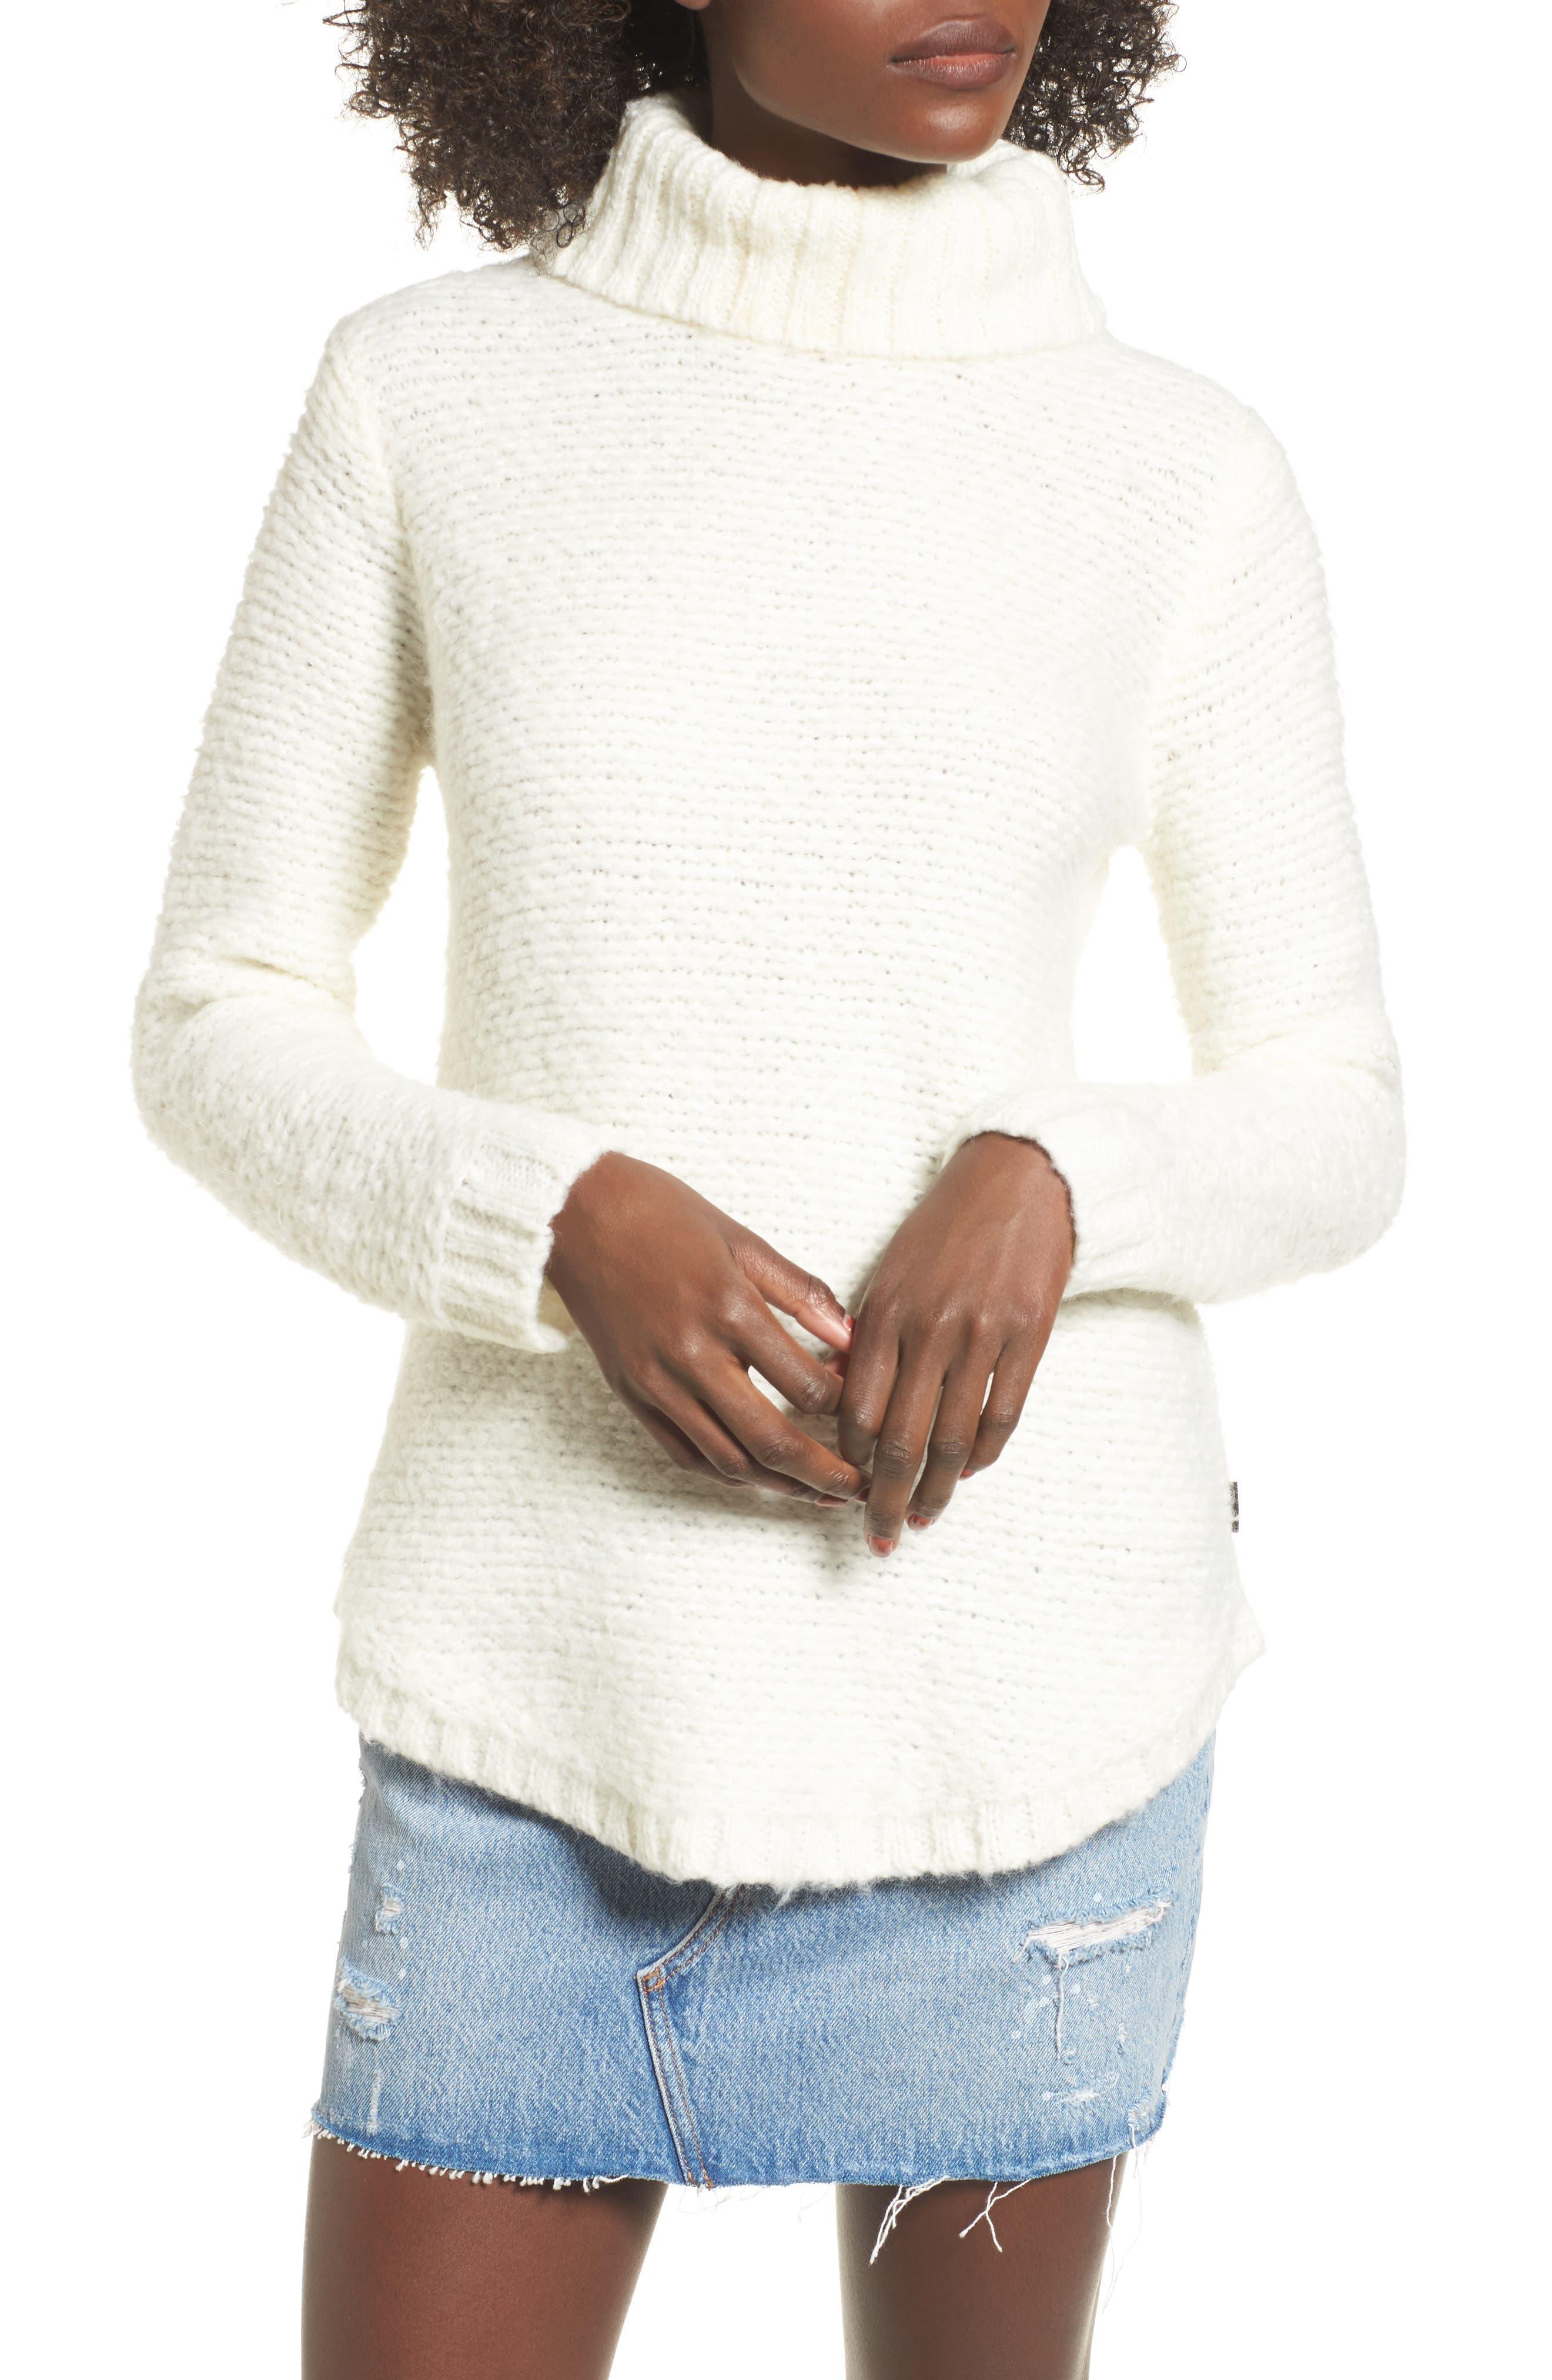 Kinks Turtleneck Sweater,                             Main thumbnail 2, color,